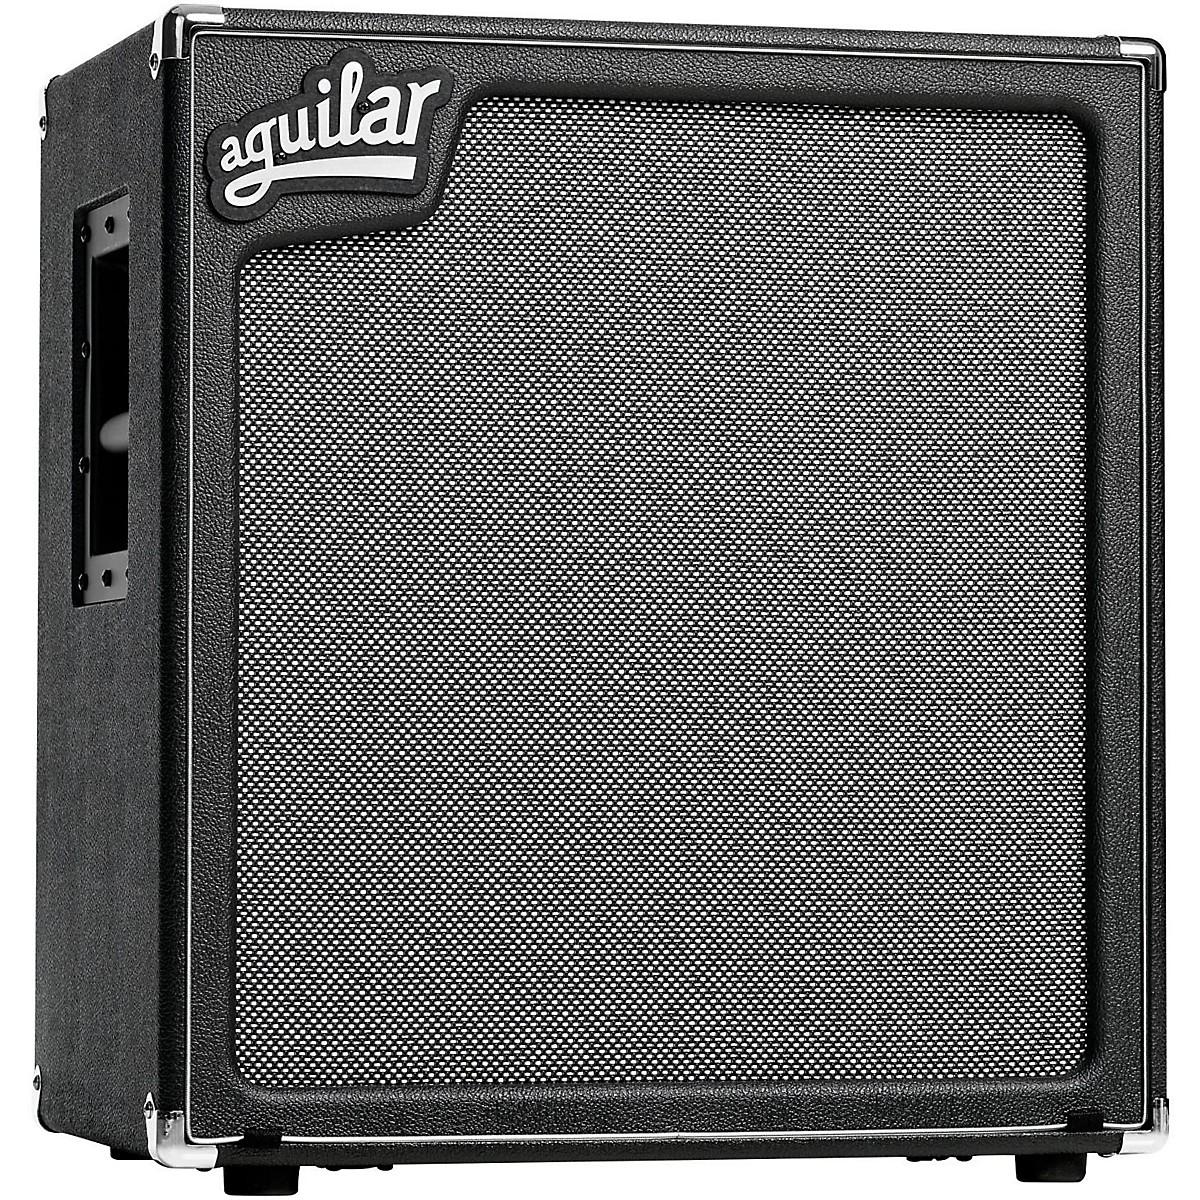 Aguilar SL 410x 800W 4x10 8 ohm Super Light Bass Cabinet